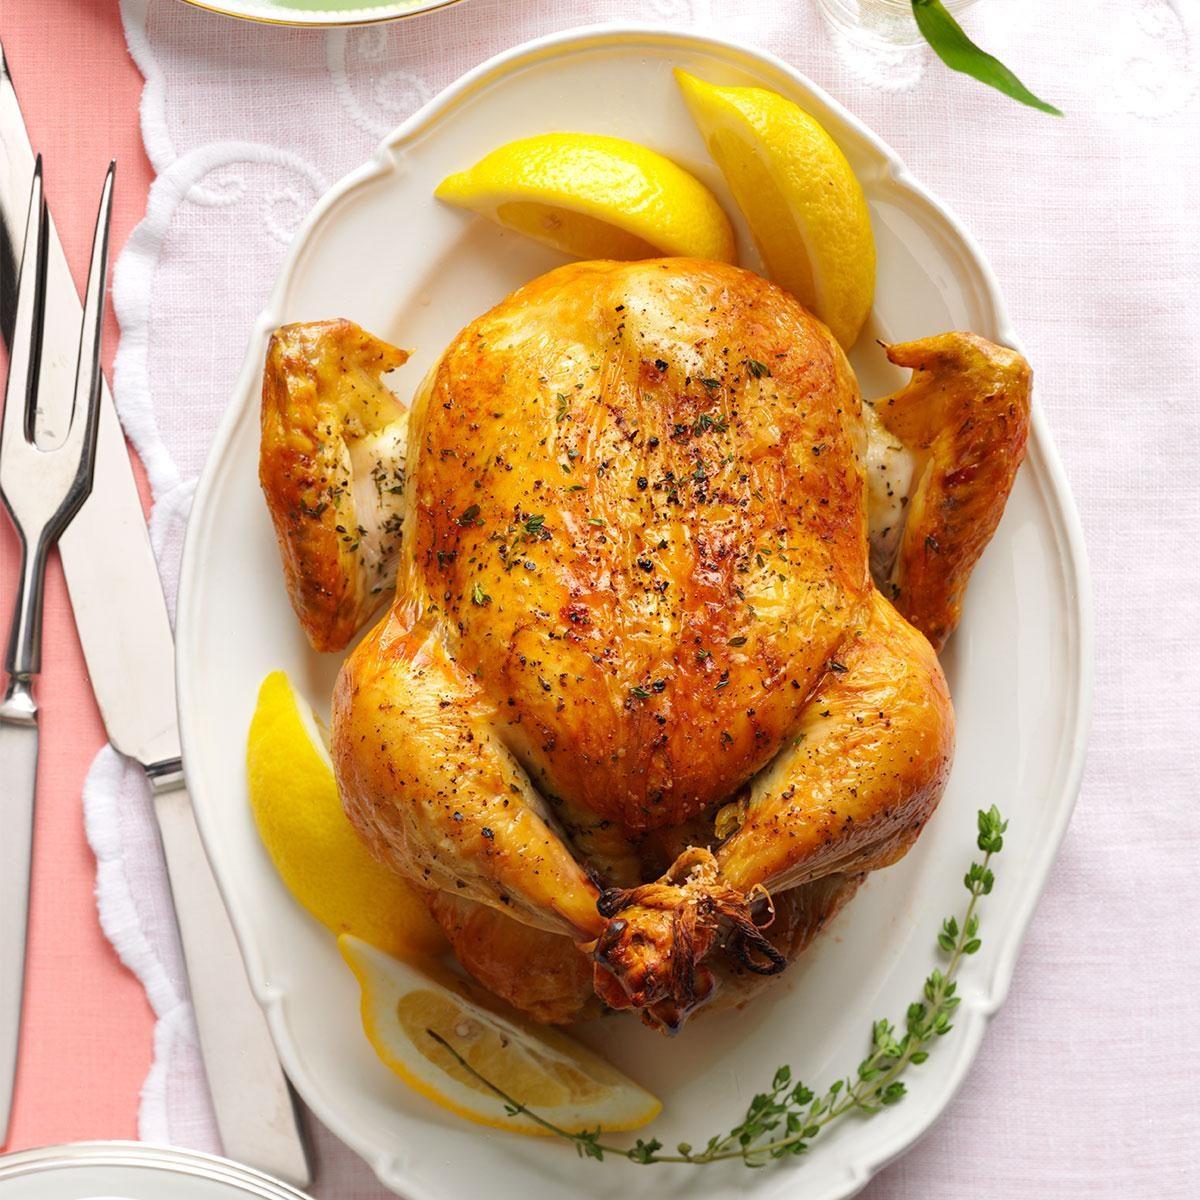 Lemon & Thyme Roasted Chicken Recipe